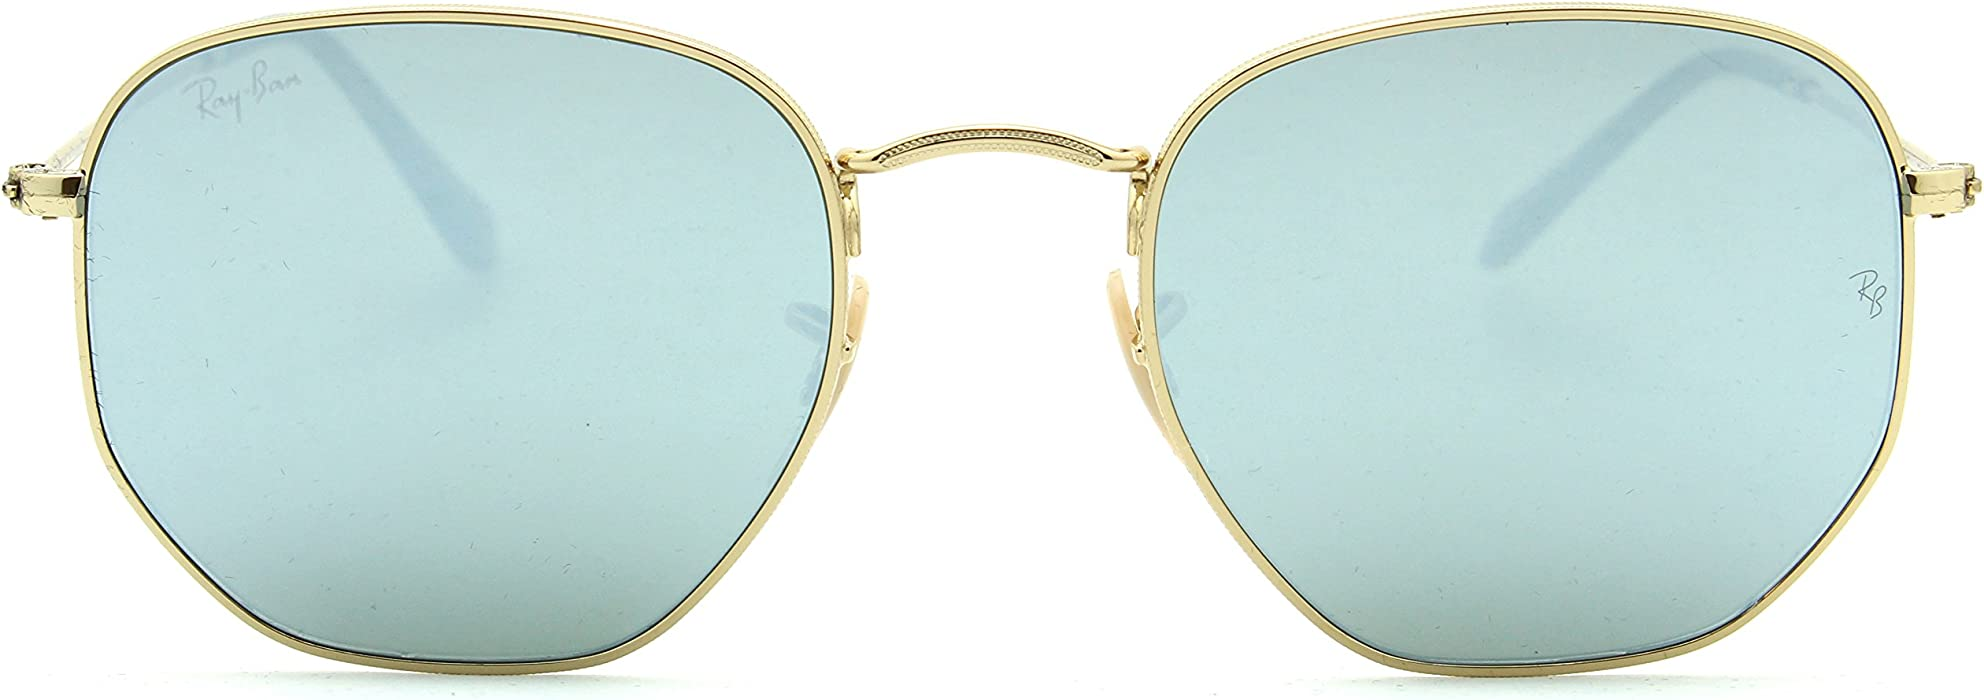 Amazon.com  Ray-Ban RB3548N Hexagonal Flat Lenses Unisex Sunglasses 001 30  - 54mm  Clothing 6d11a96690